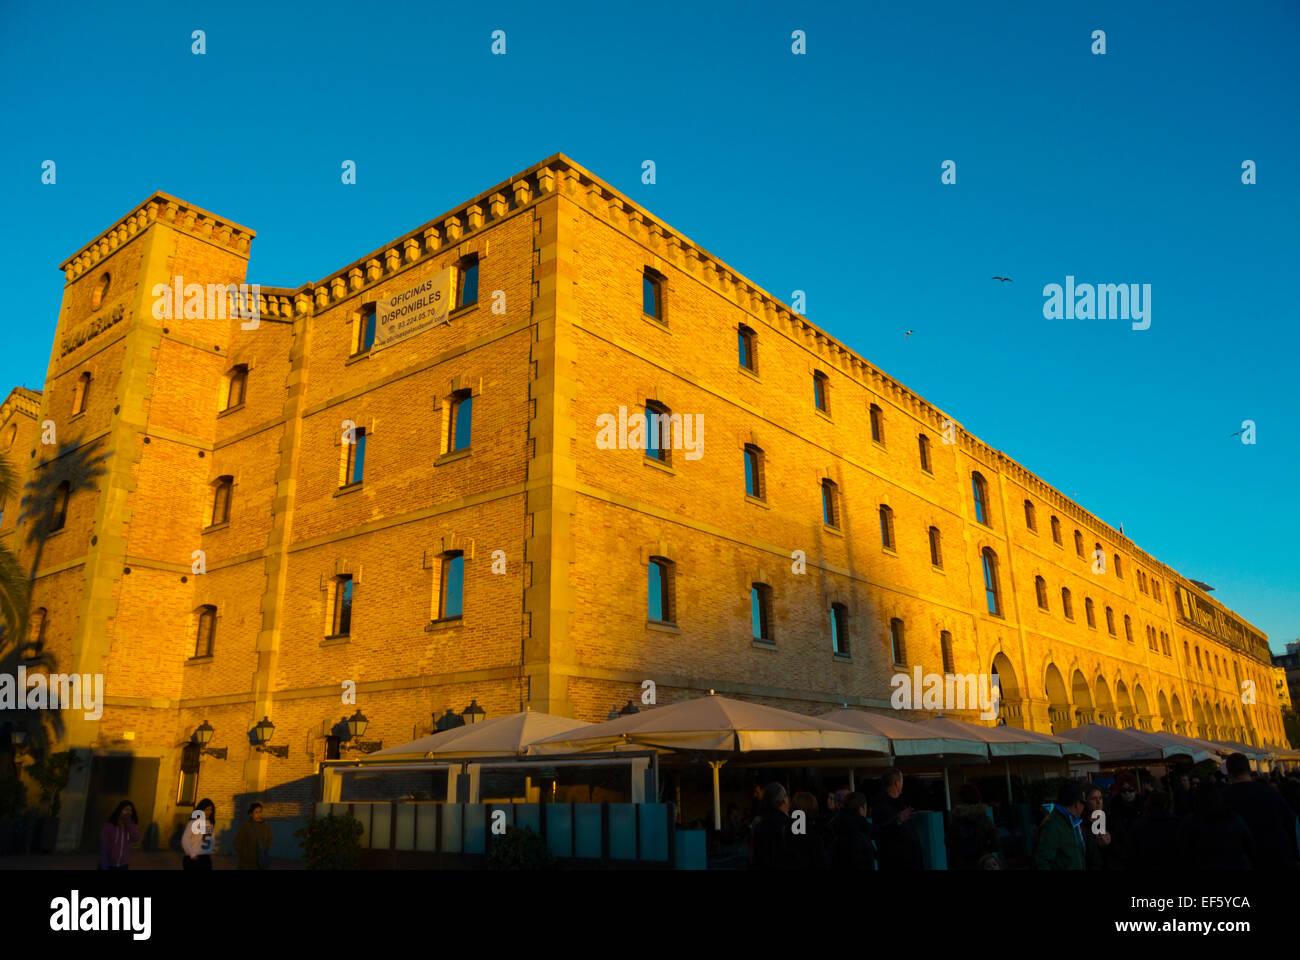 Palau de Mar, housing Catalonia history museum, Port Vell, Barcelona, Spain - Stock Image